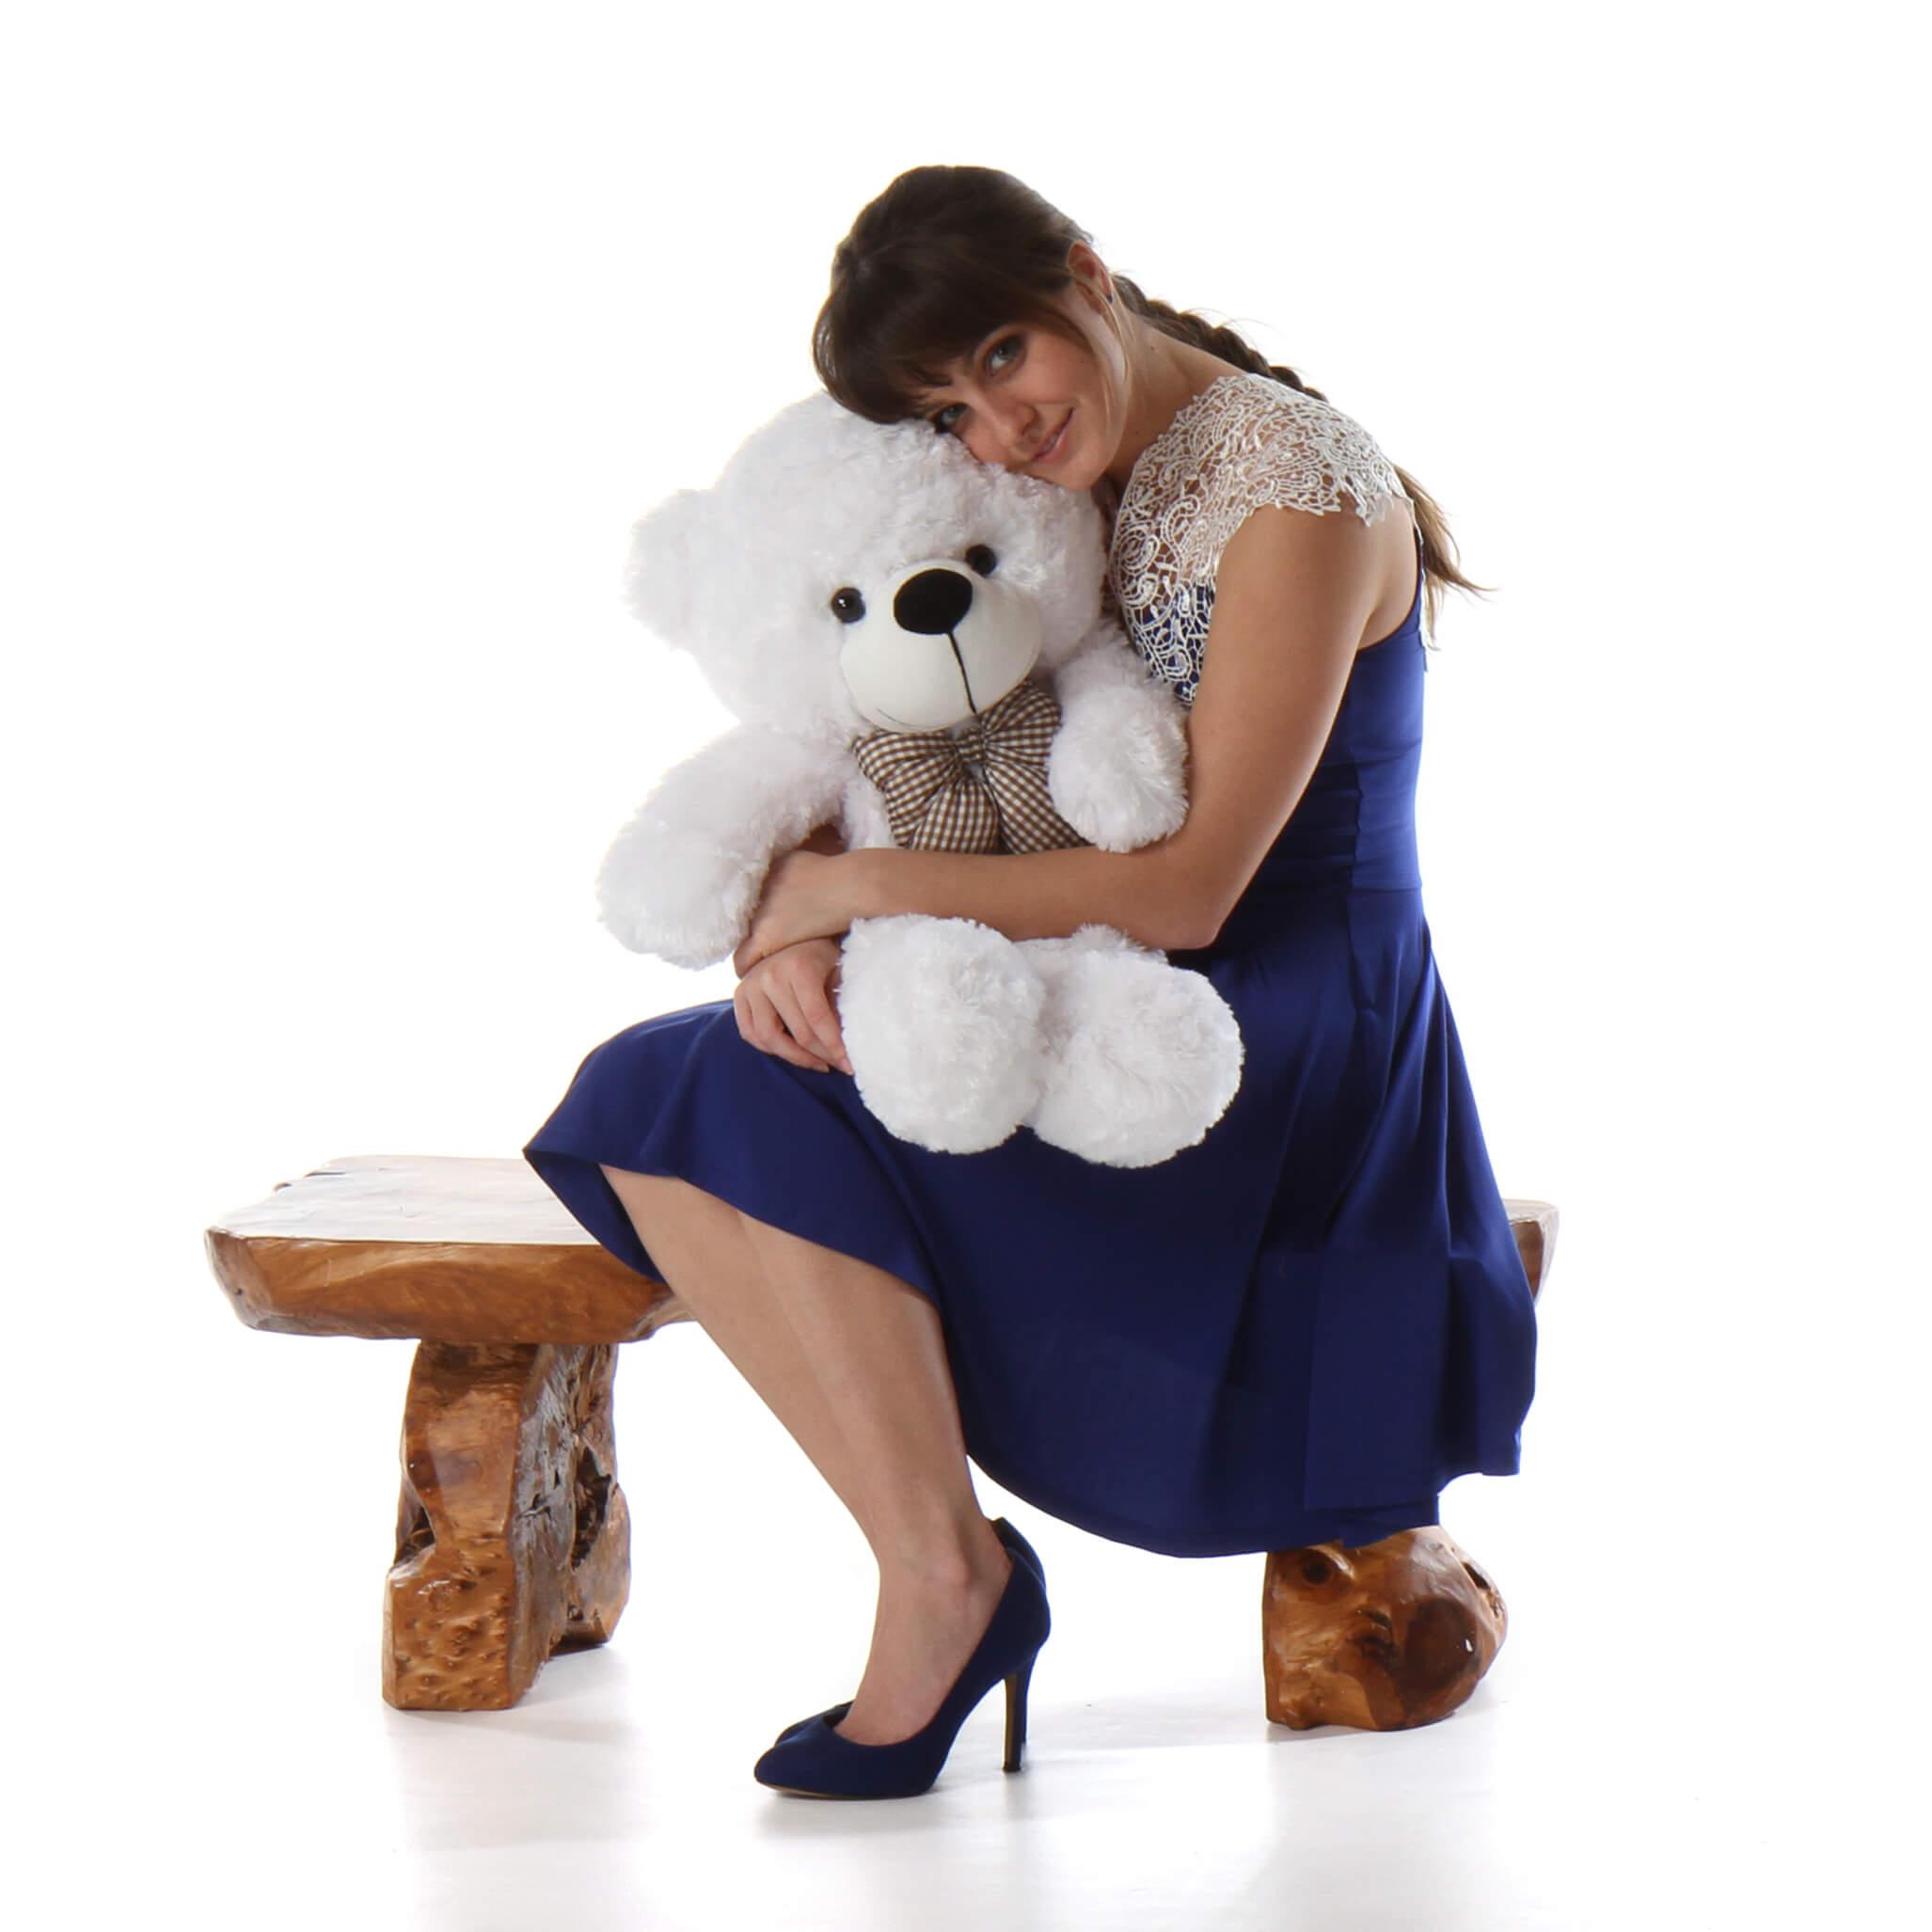 huggable-oversized-white-teddy-bear-coco-cuddles-30in-1.jpg